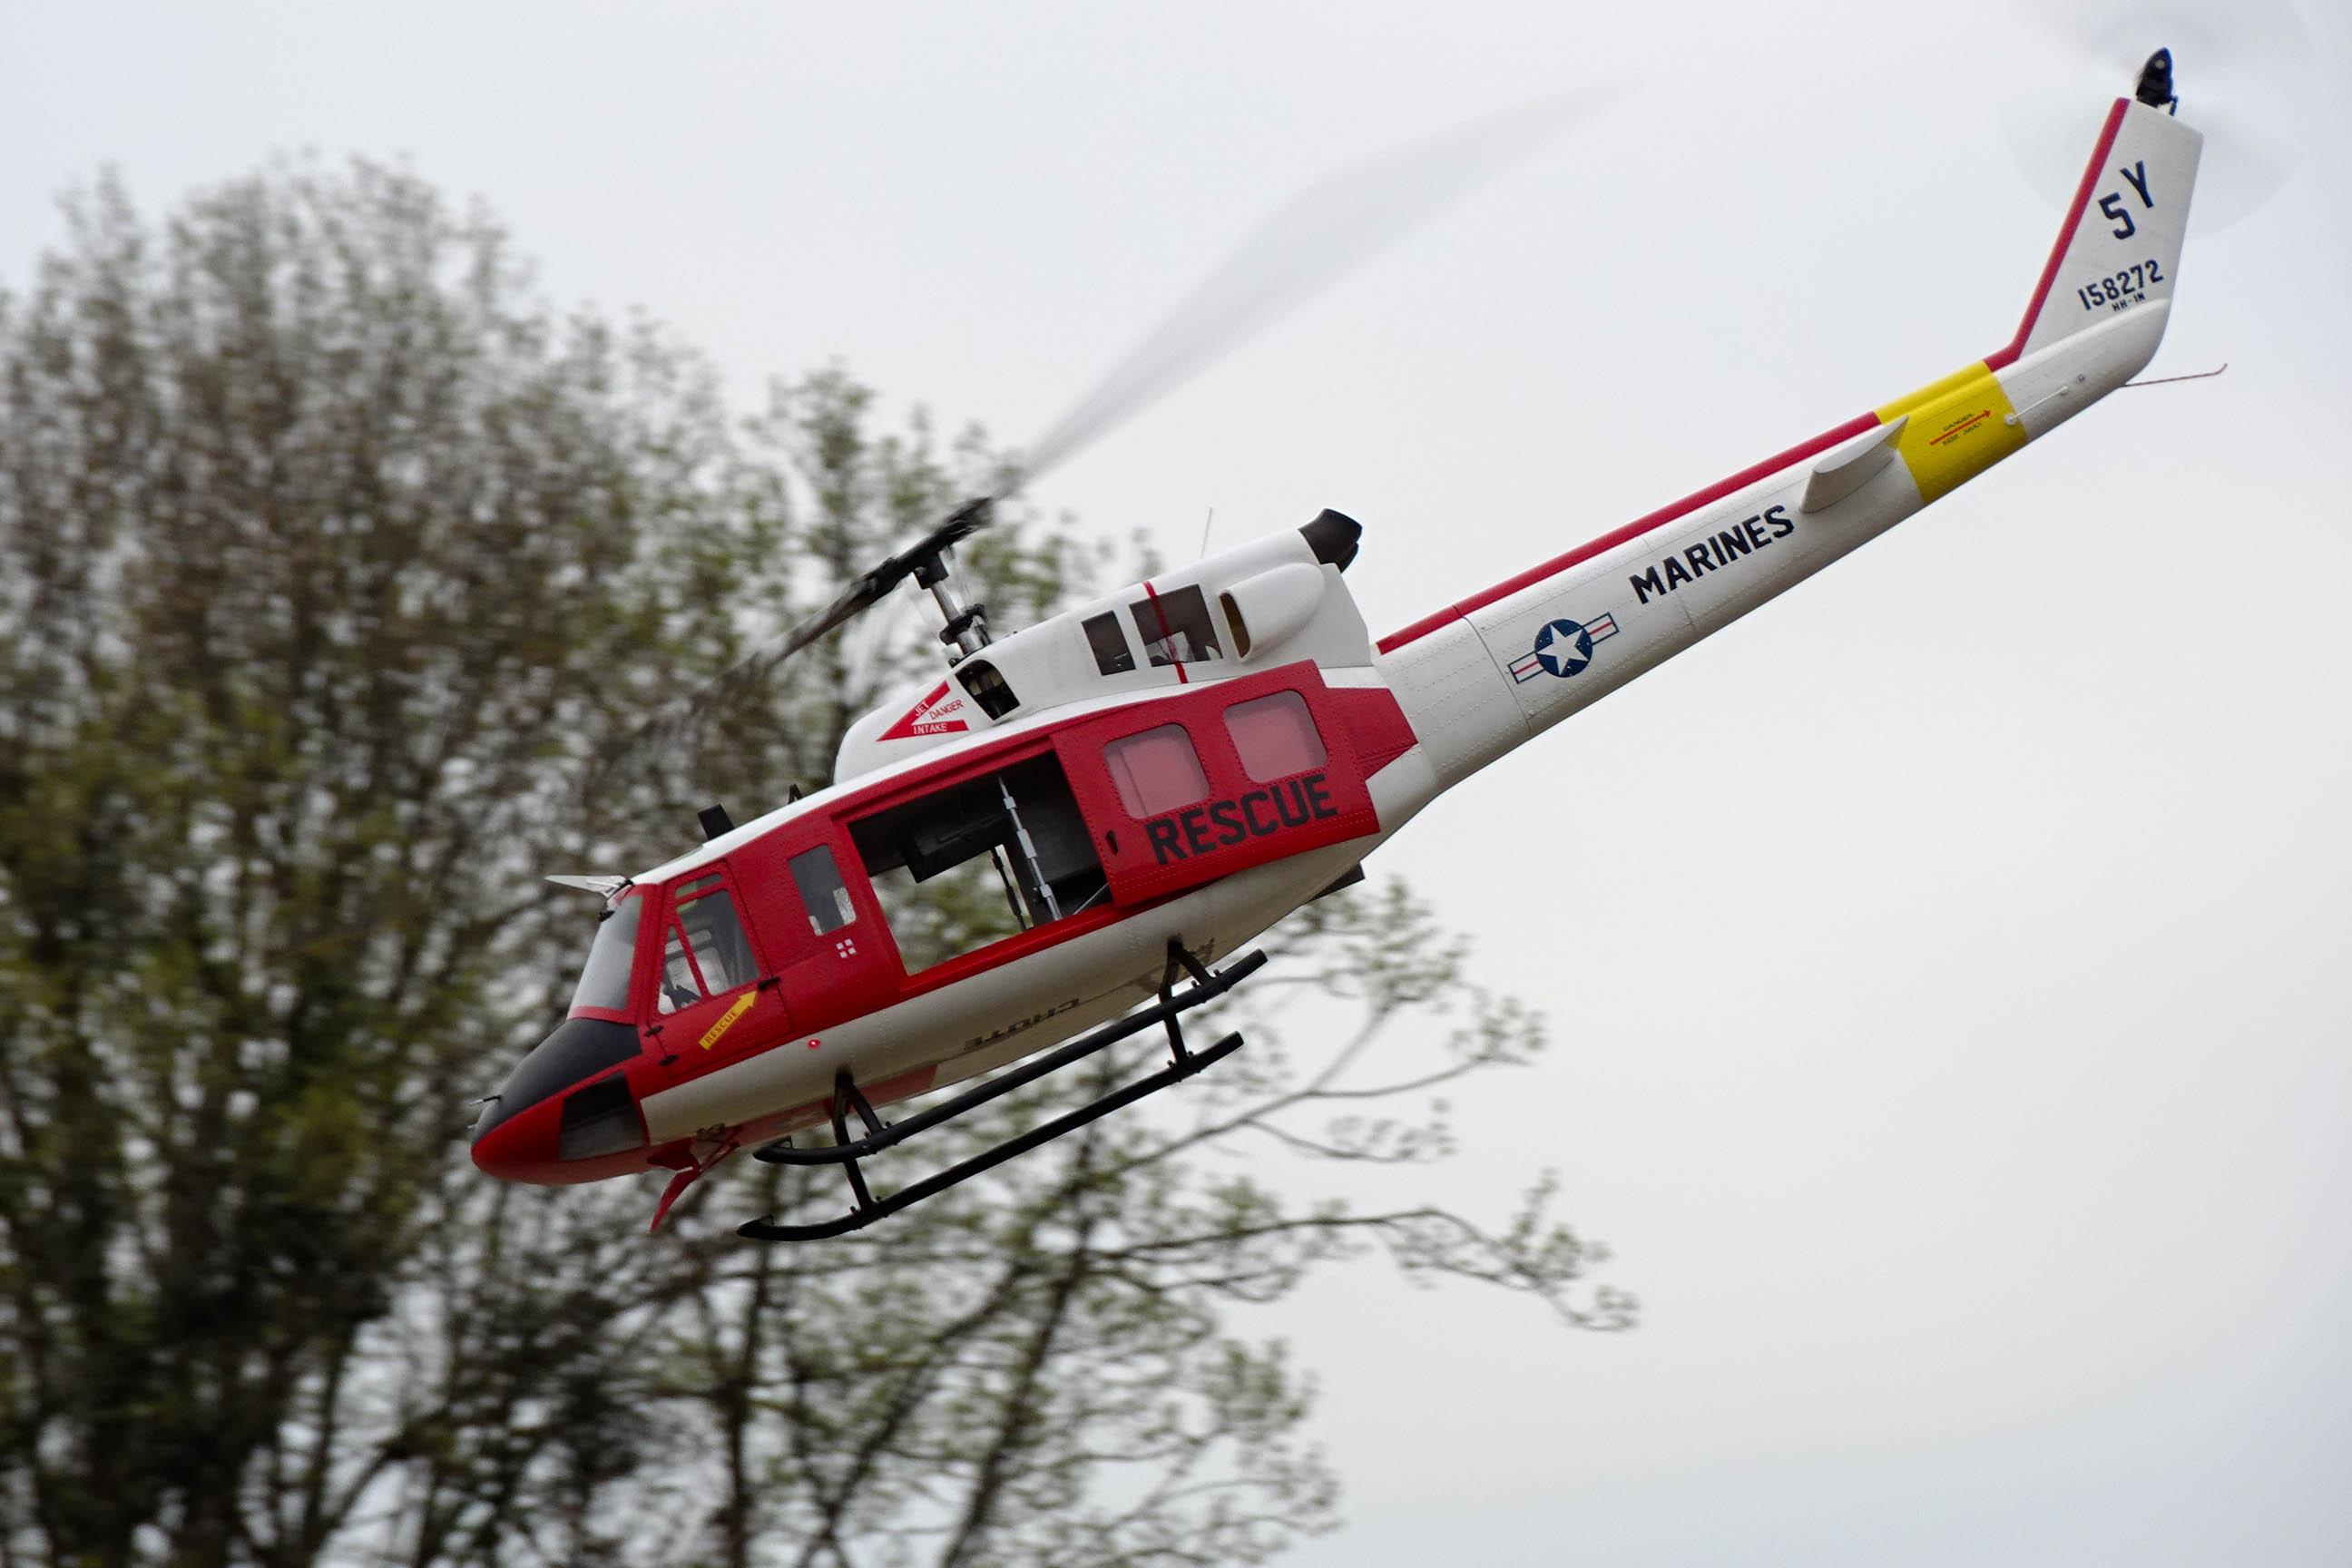 UH-1N RESCUE